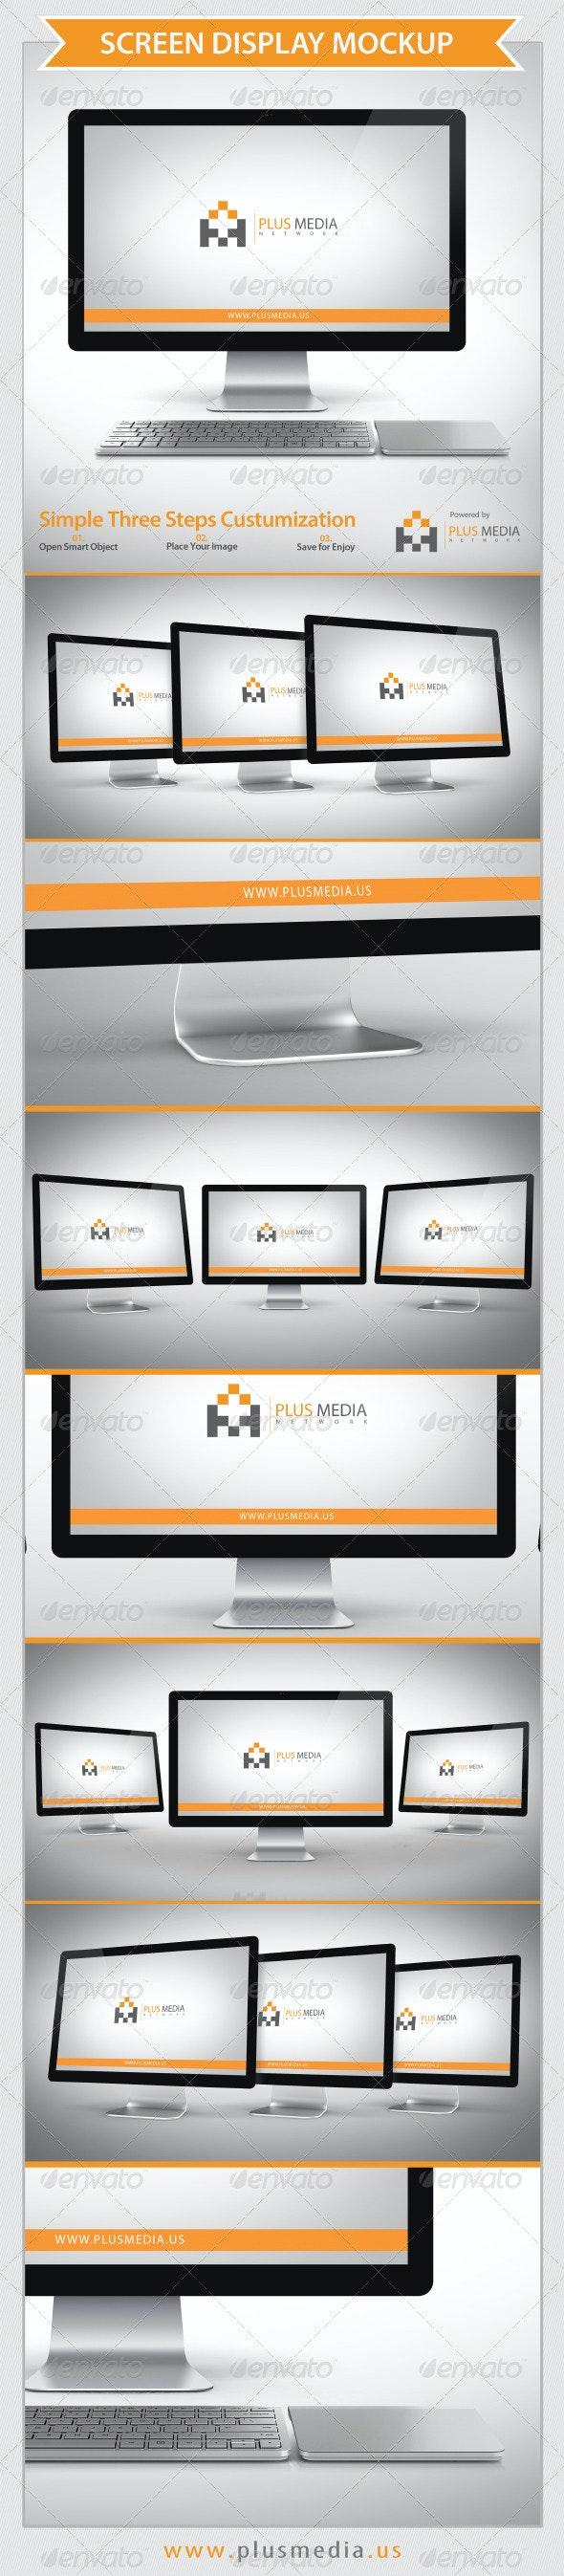 Screen Display Mockup - Product Mock-Ups Graphics